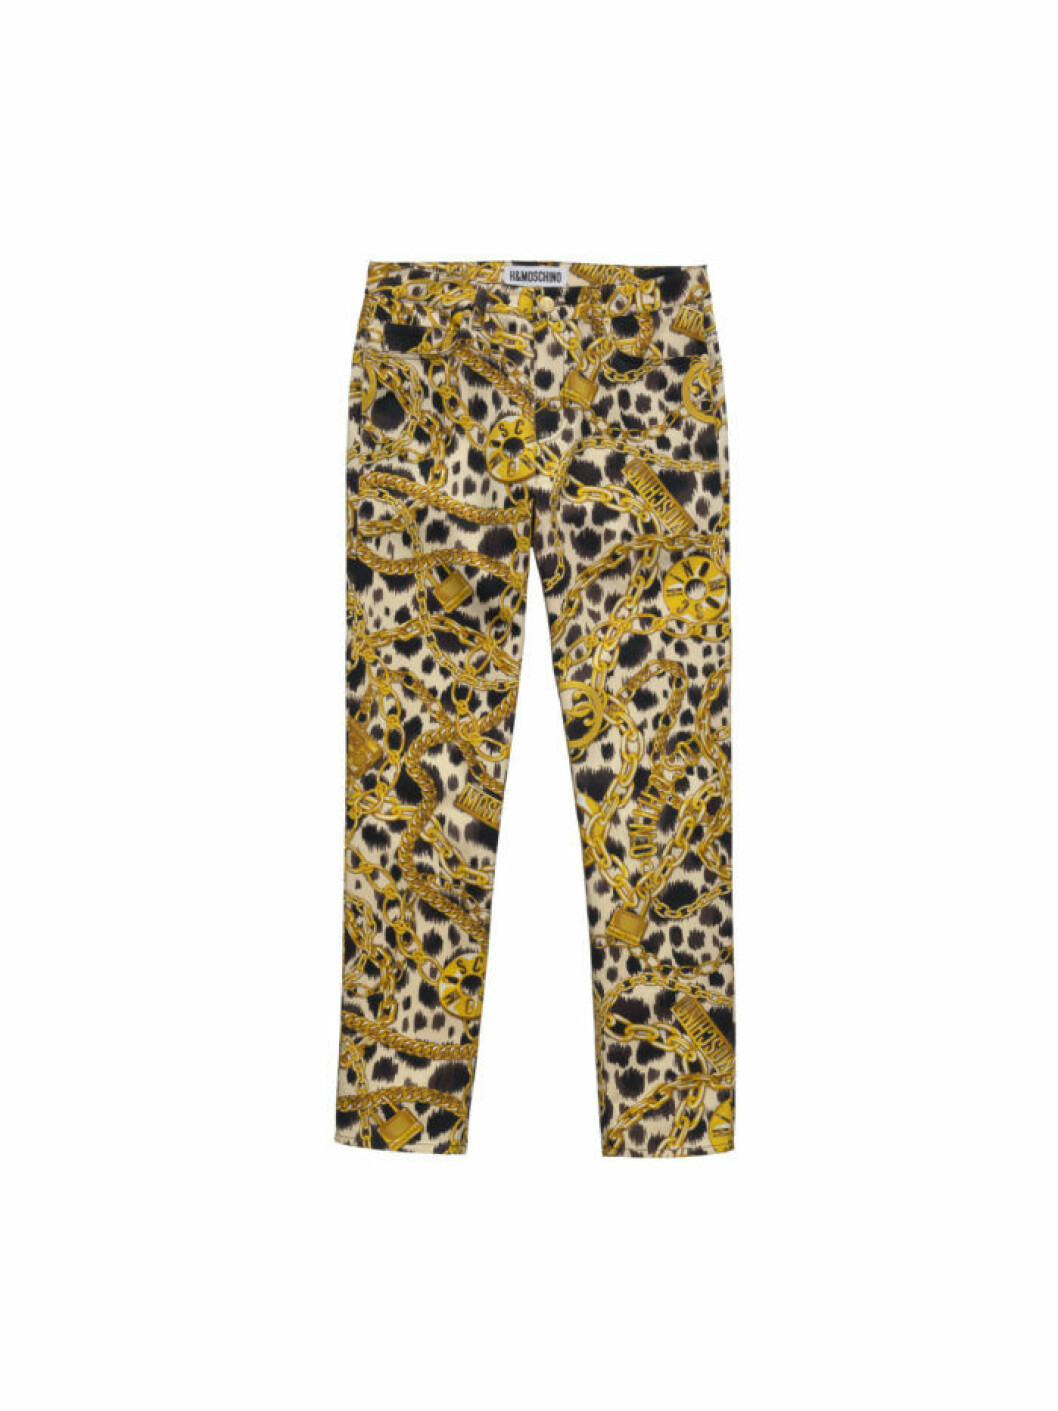 Byxor med leo- och guldkedjeprint Moschino [tv] H&M